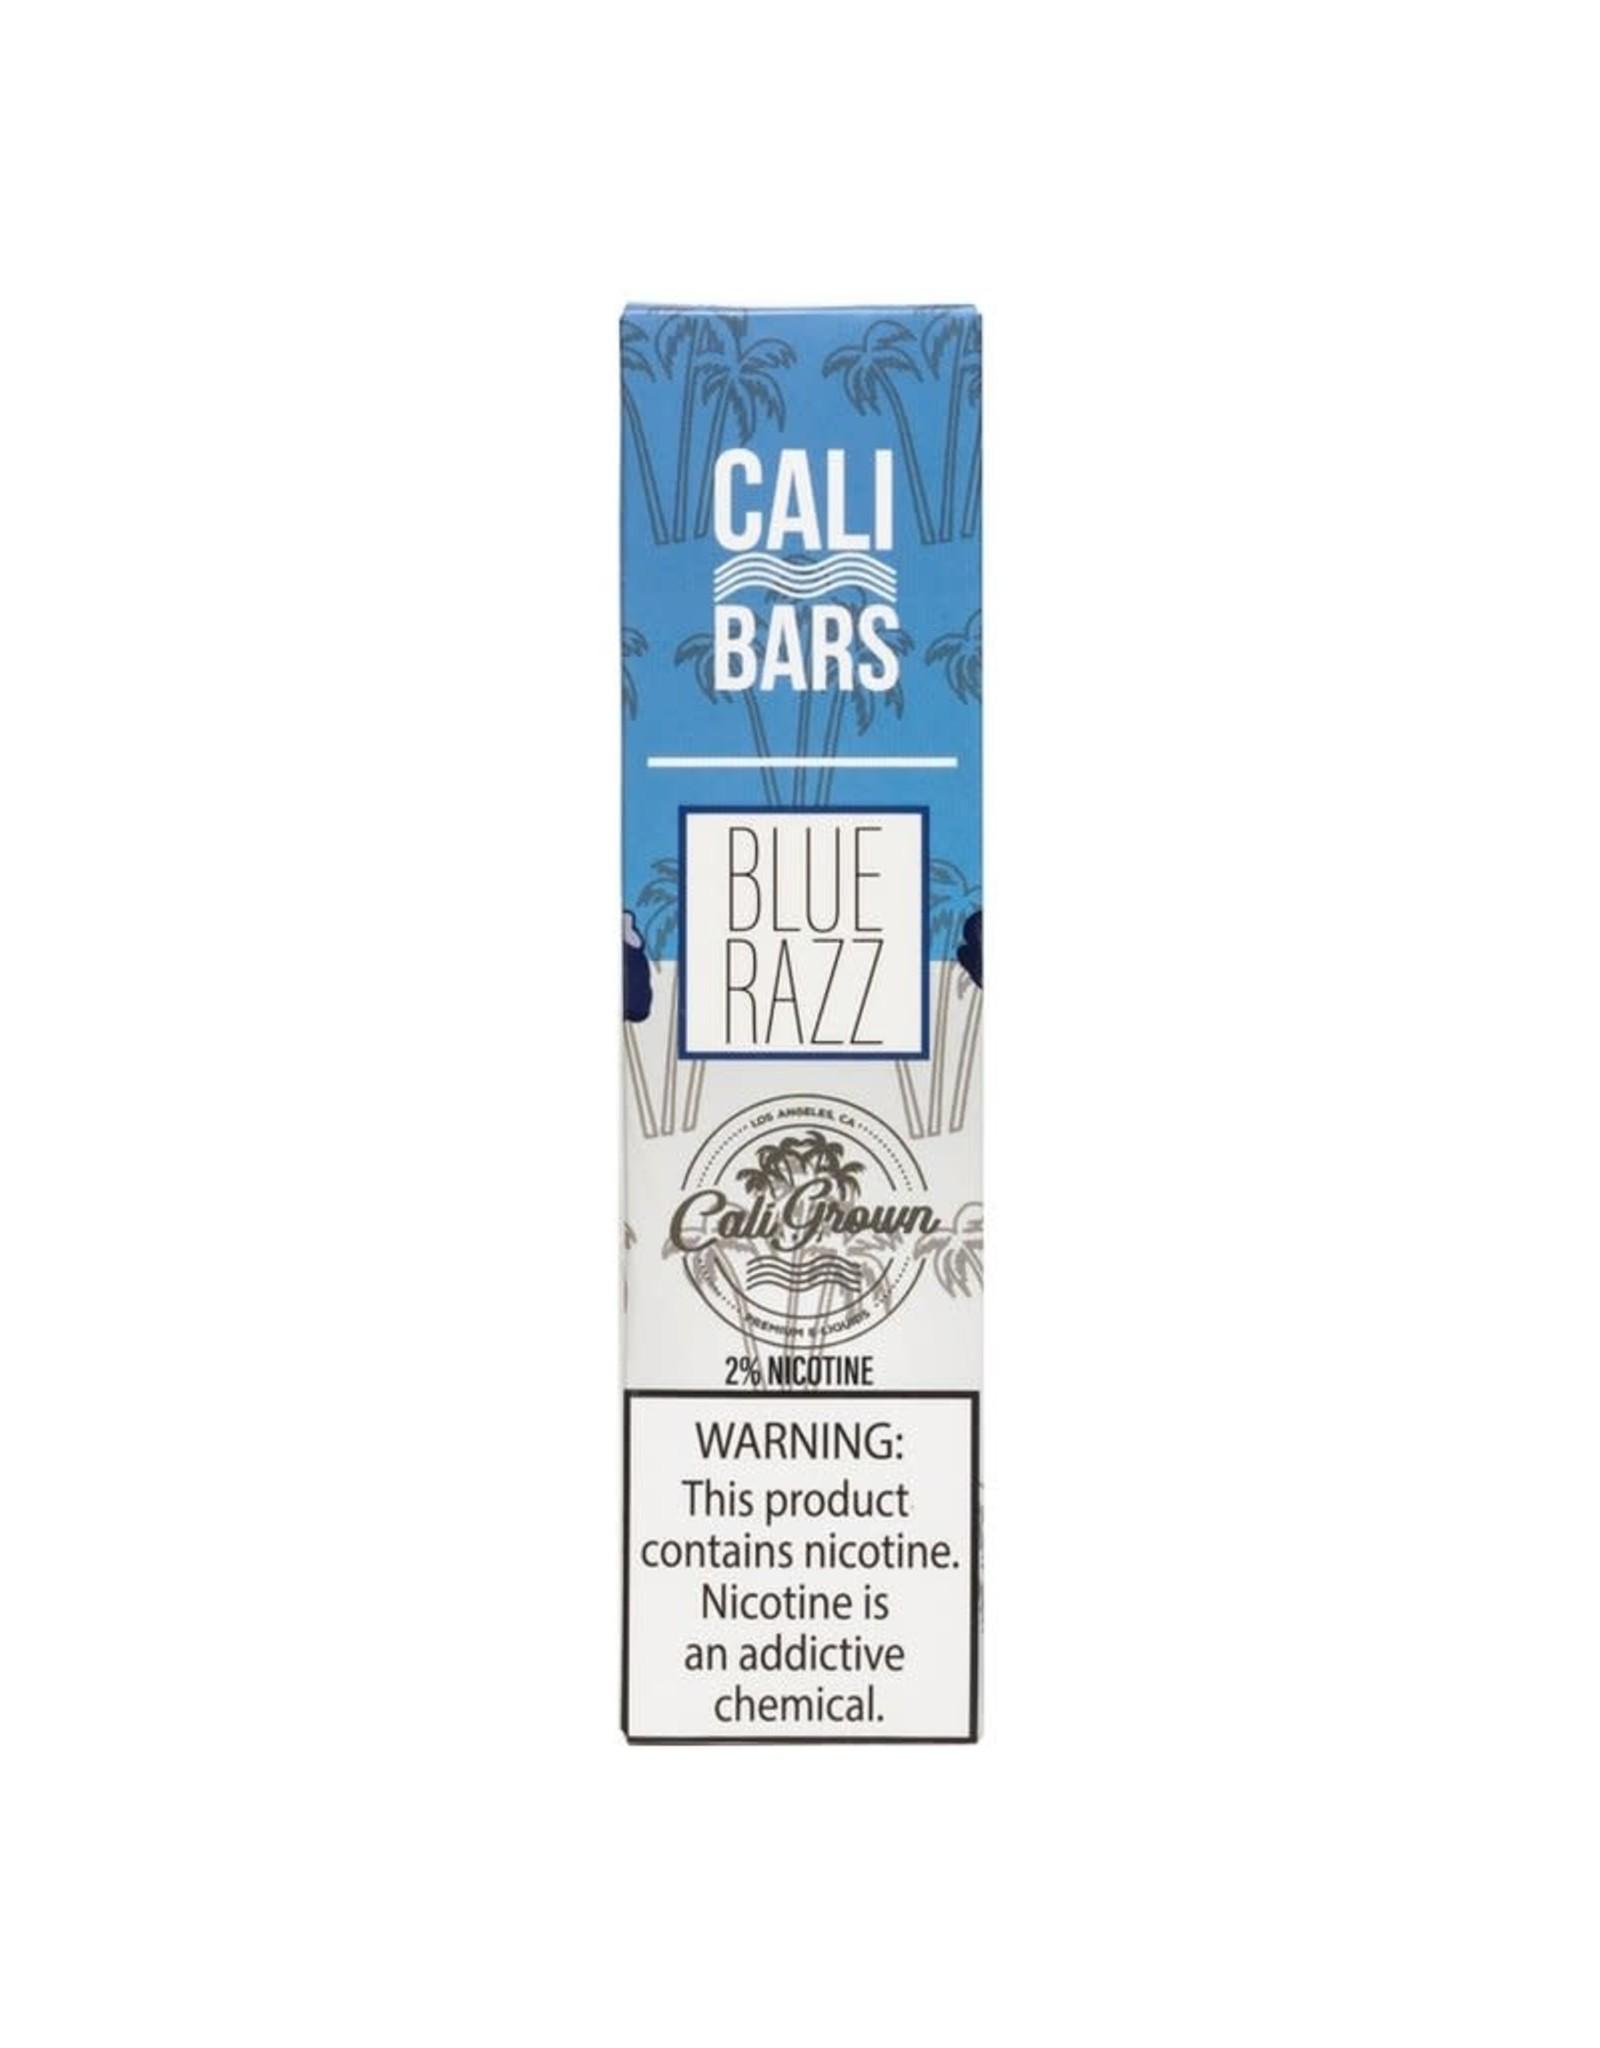 Cali Bars Cali Bars Blue Razz 5%